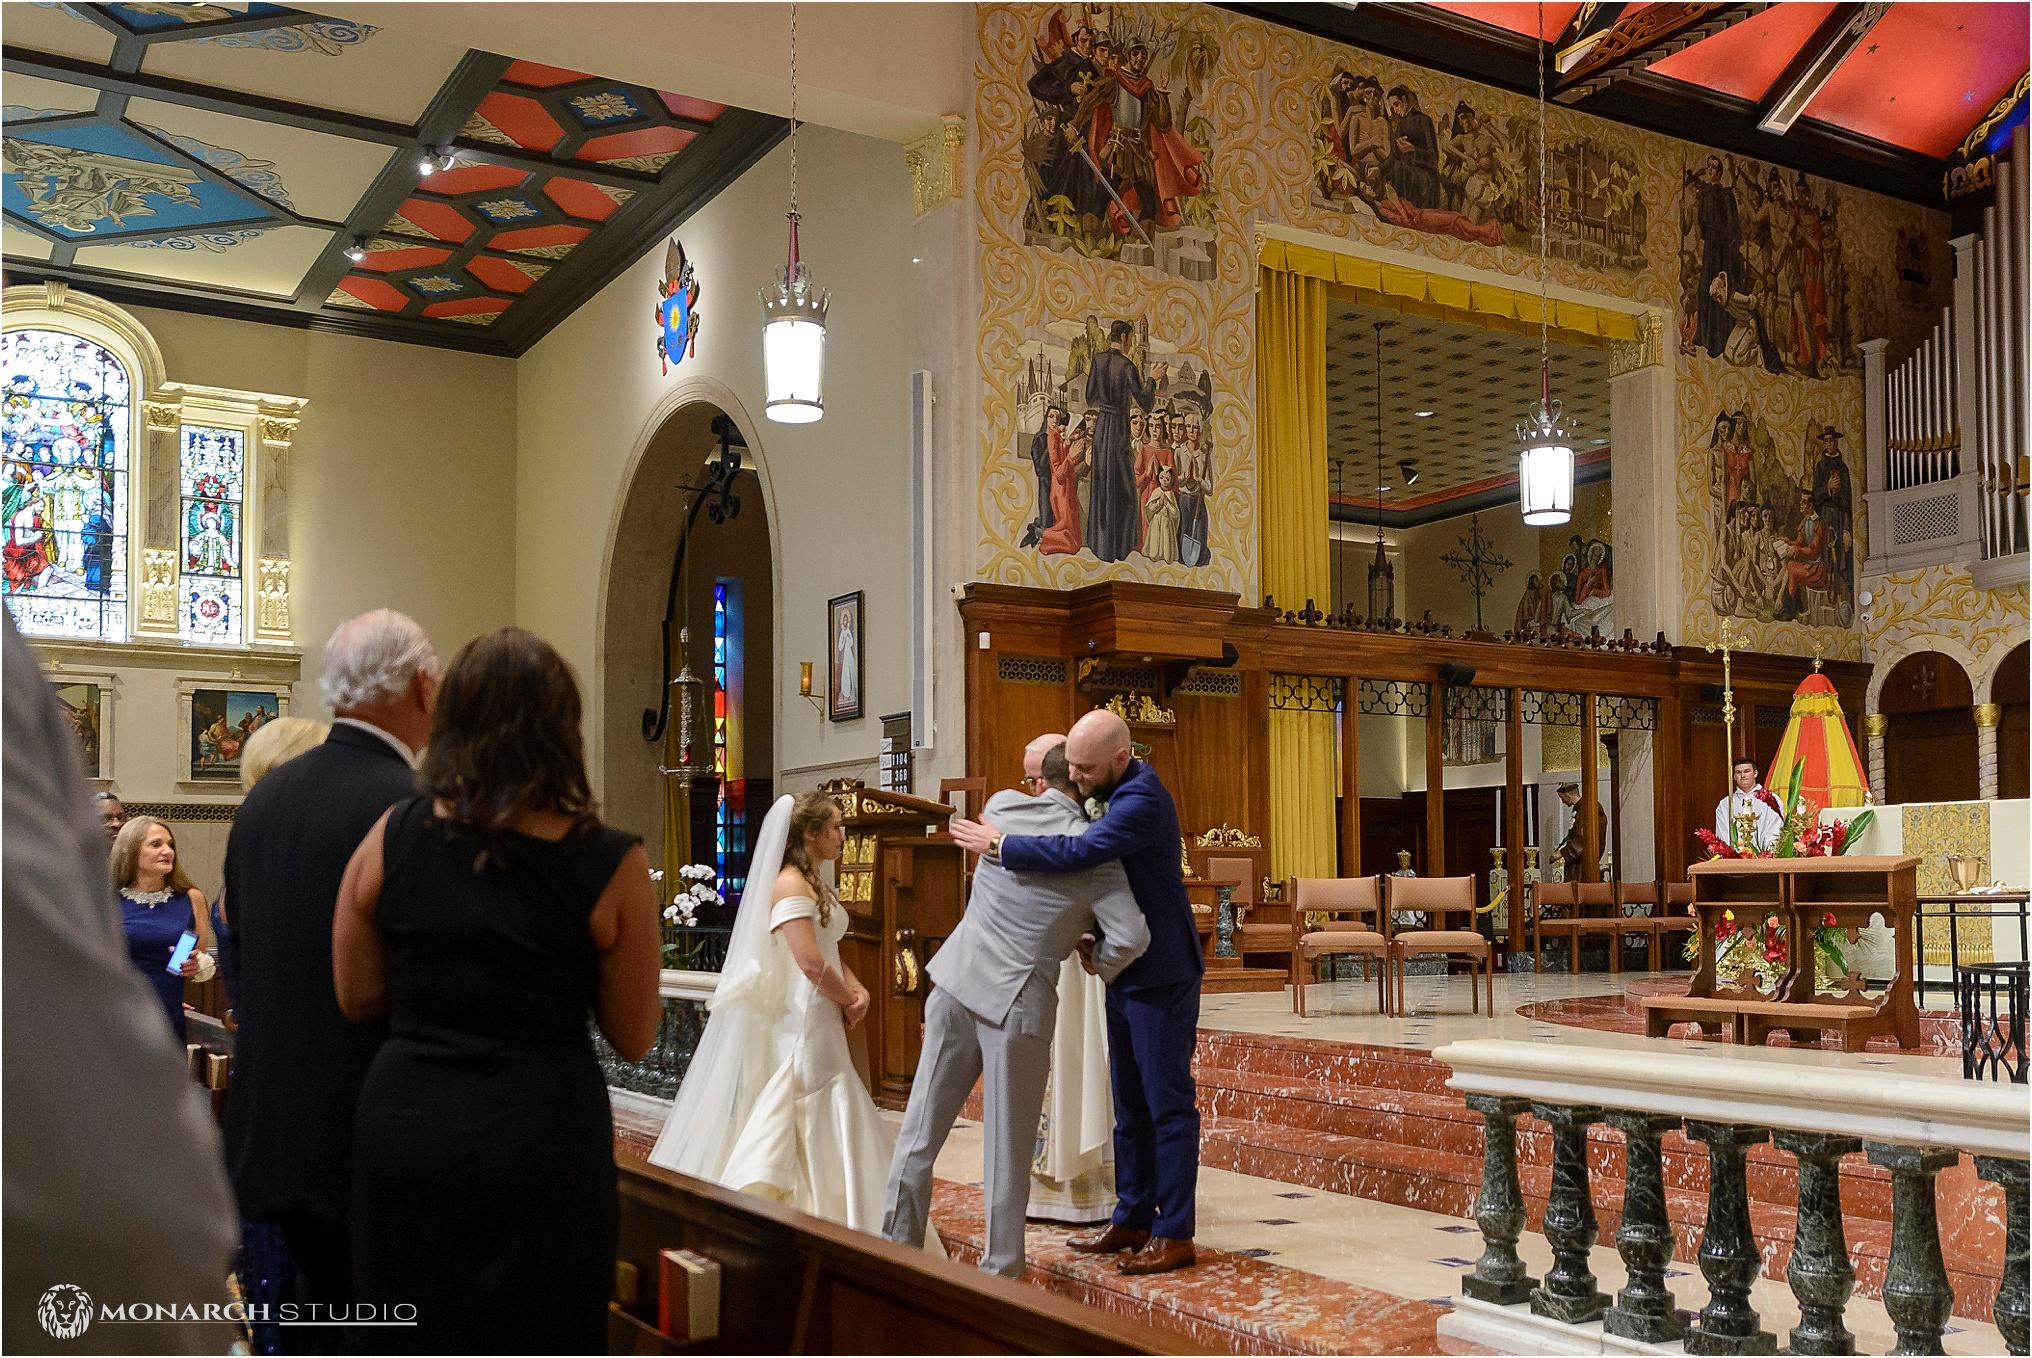 saint-augustine-photographer-Whiteroom-029.jpg